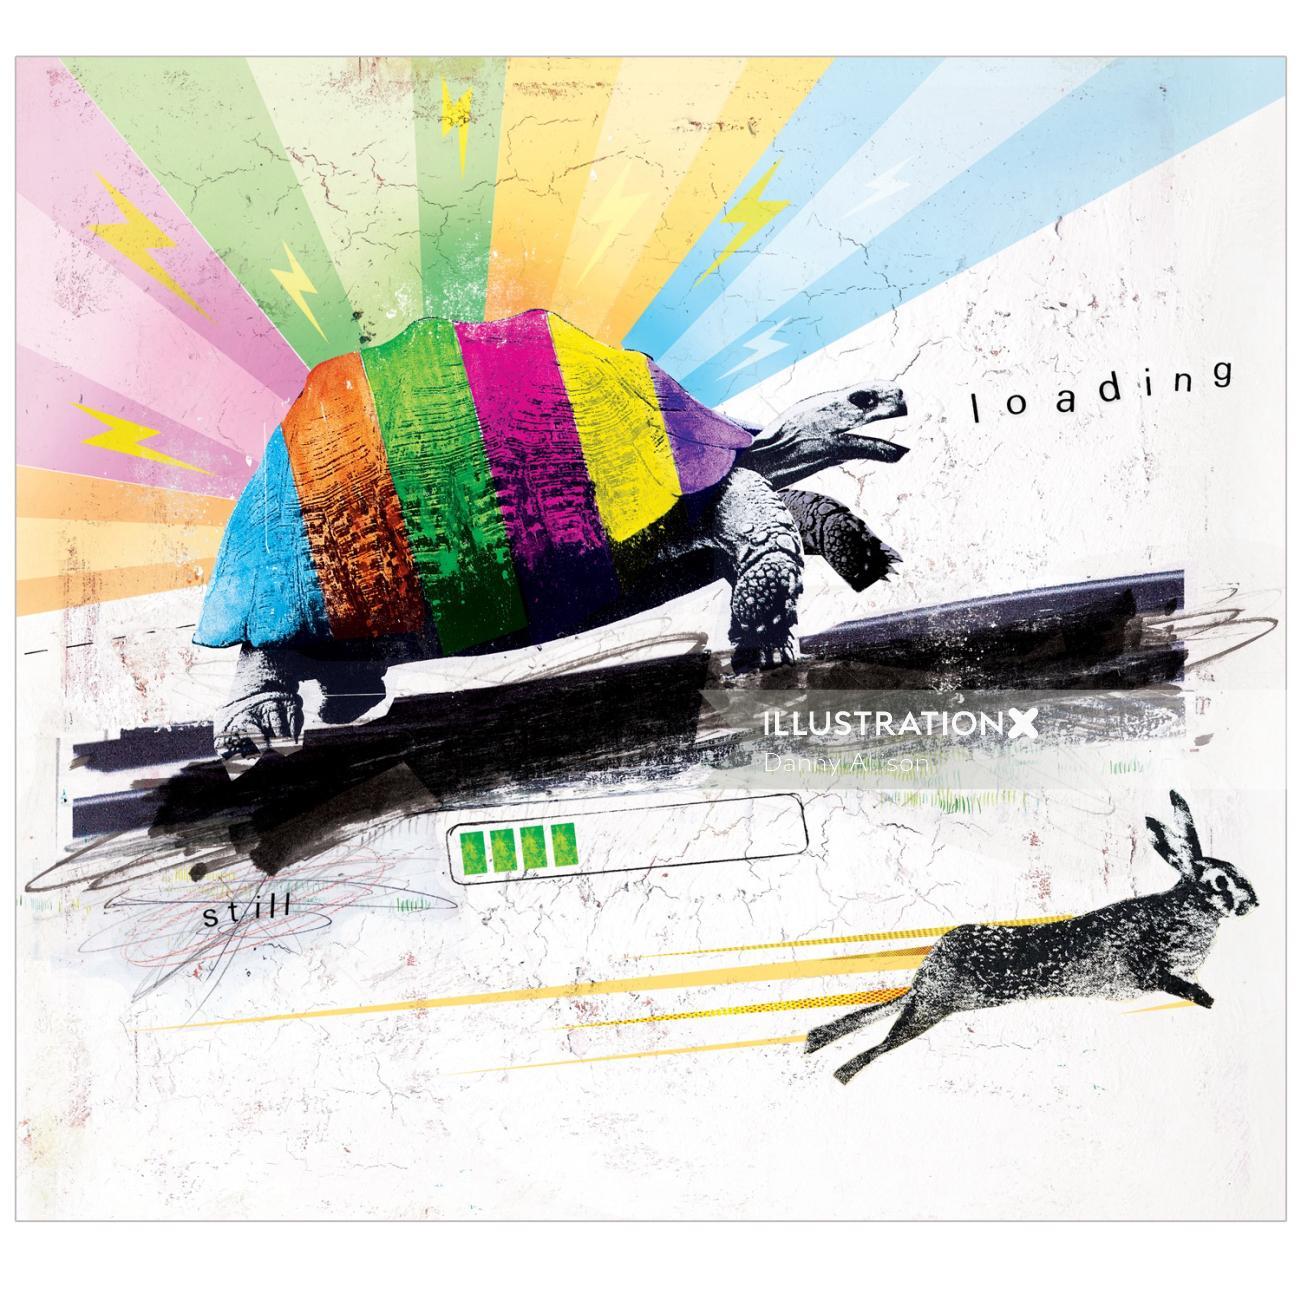 animals, tortoise, hare, rabbit, slow, fast, speed, technology, race, win, lose